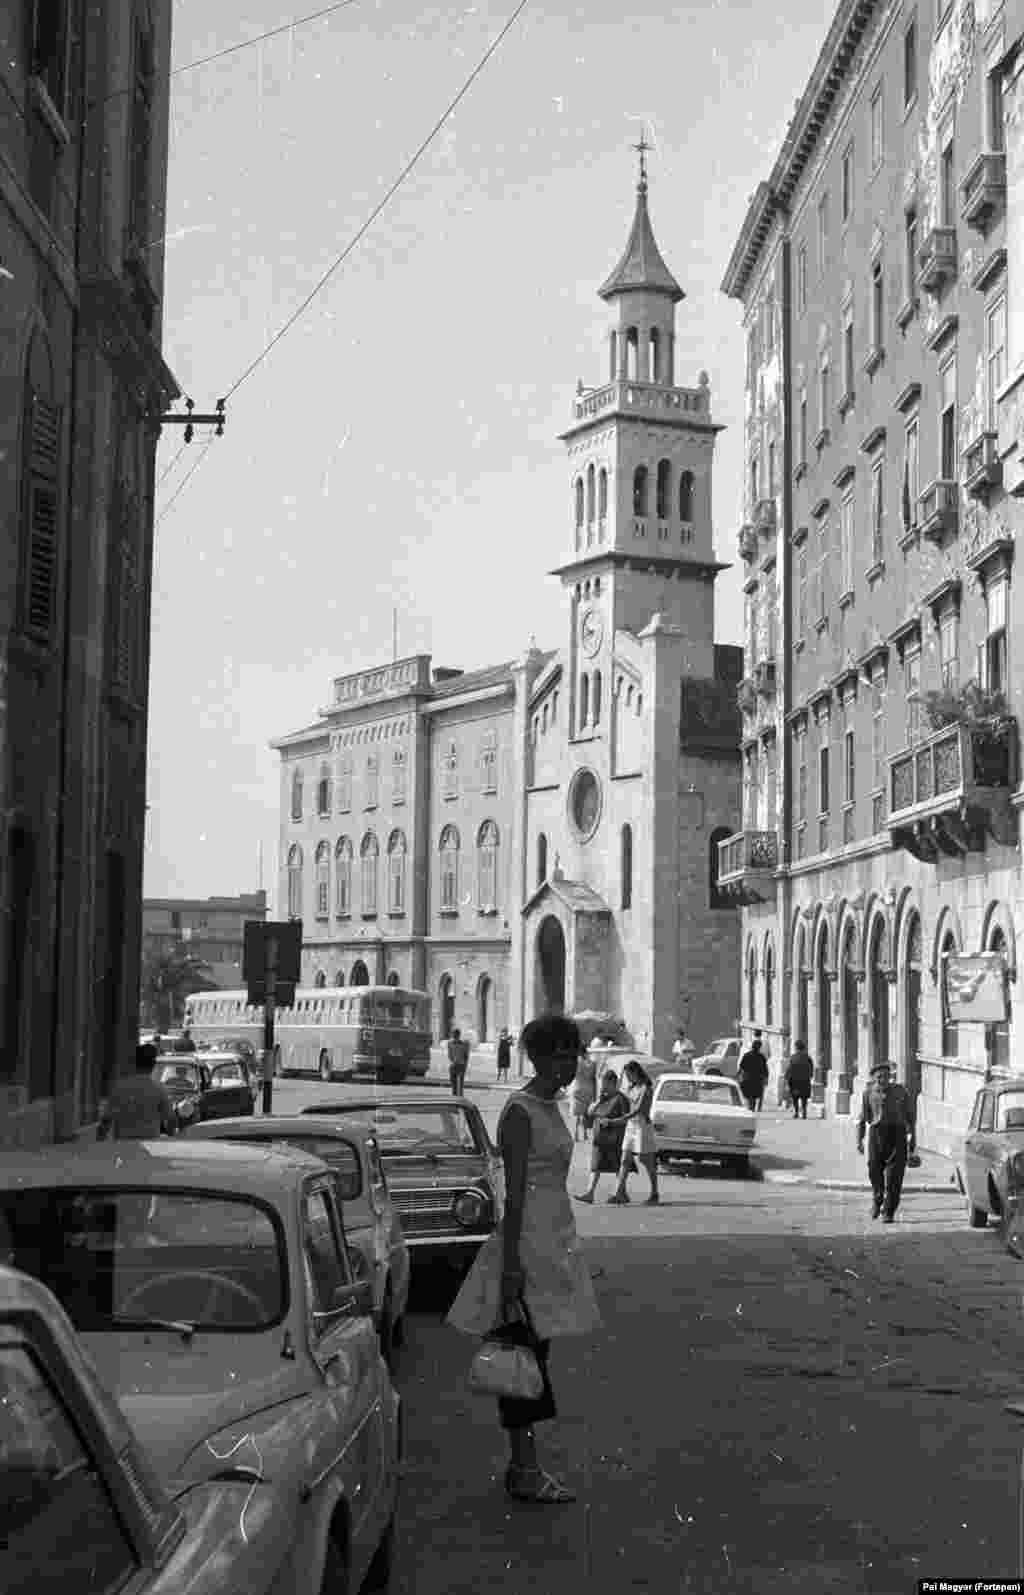 Люди гуляют по улицам Сплита, Хорватия, 1965 год.